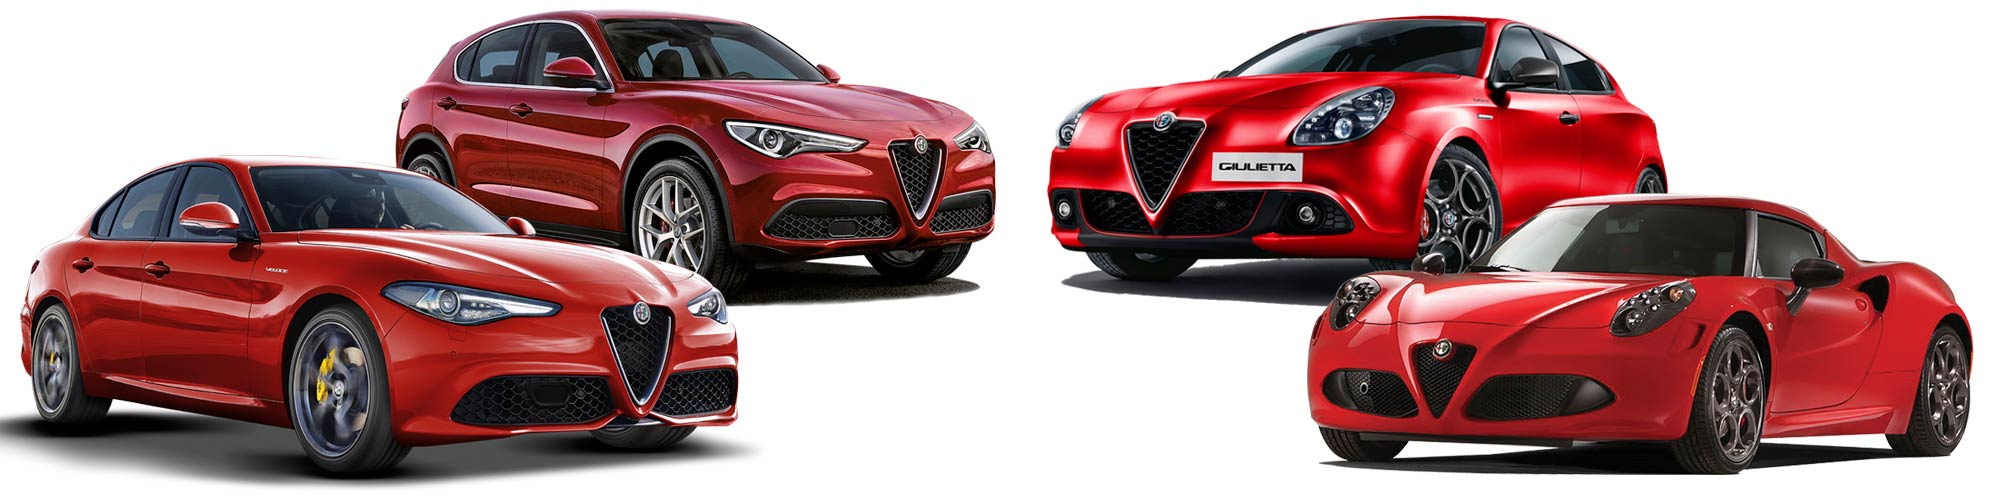 Alfa Romeo Mercuruis Motors